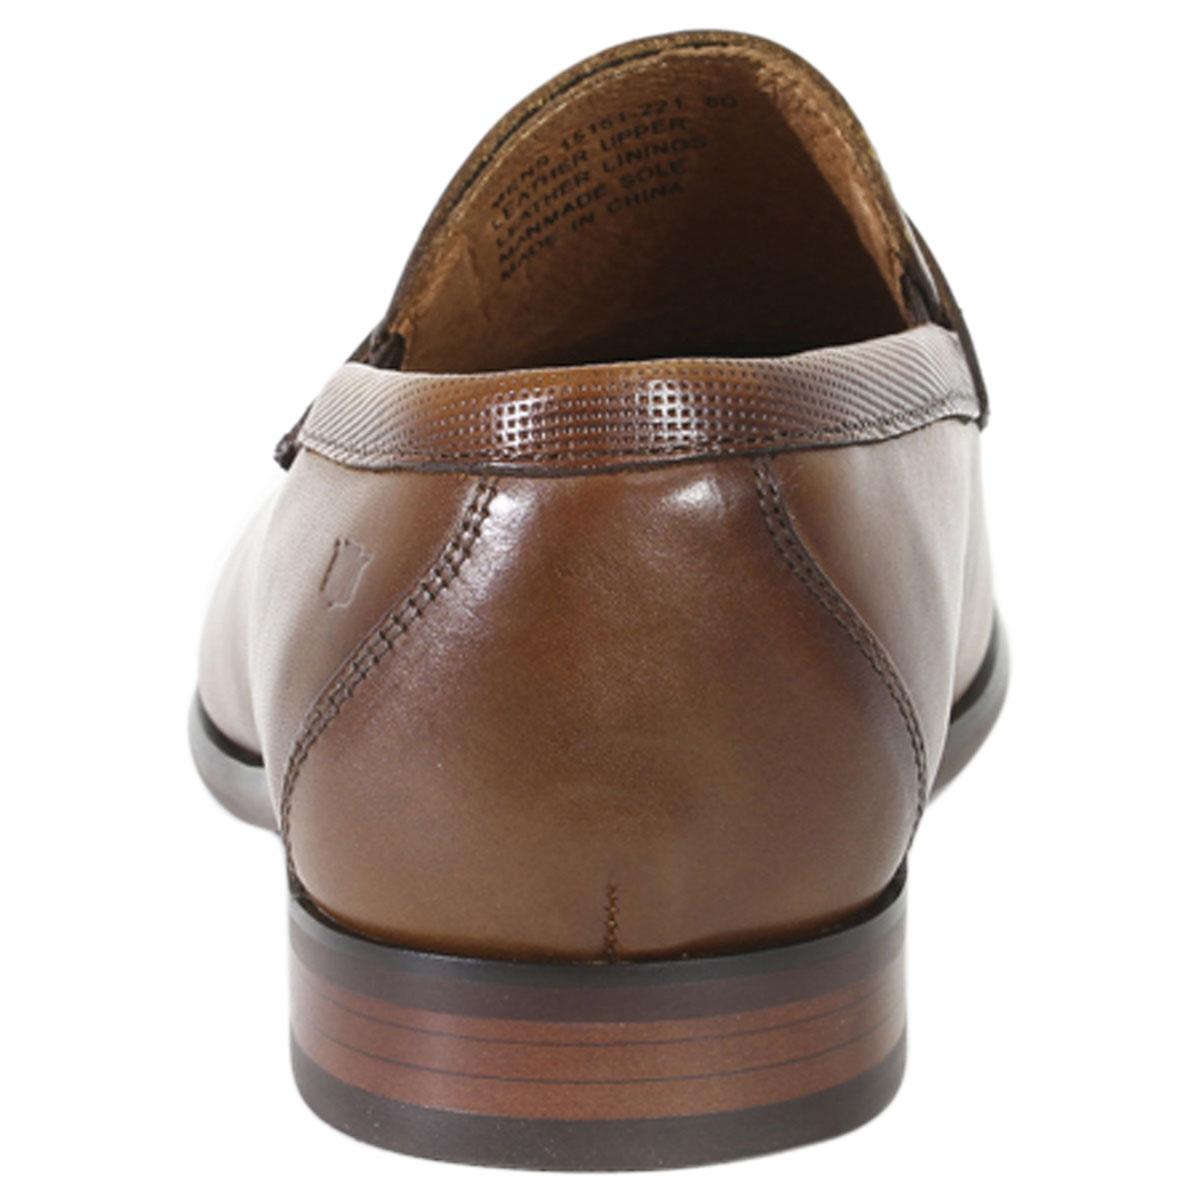 Florsheim-Men-039-s-Postino-Penny-Loafers-Shoes thumbnail 18